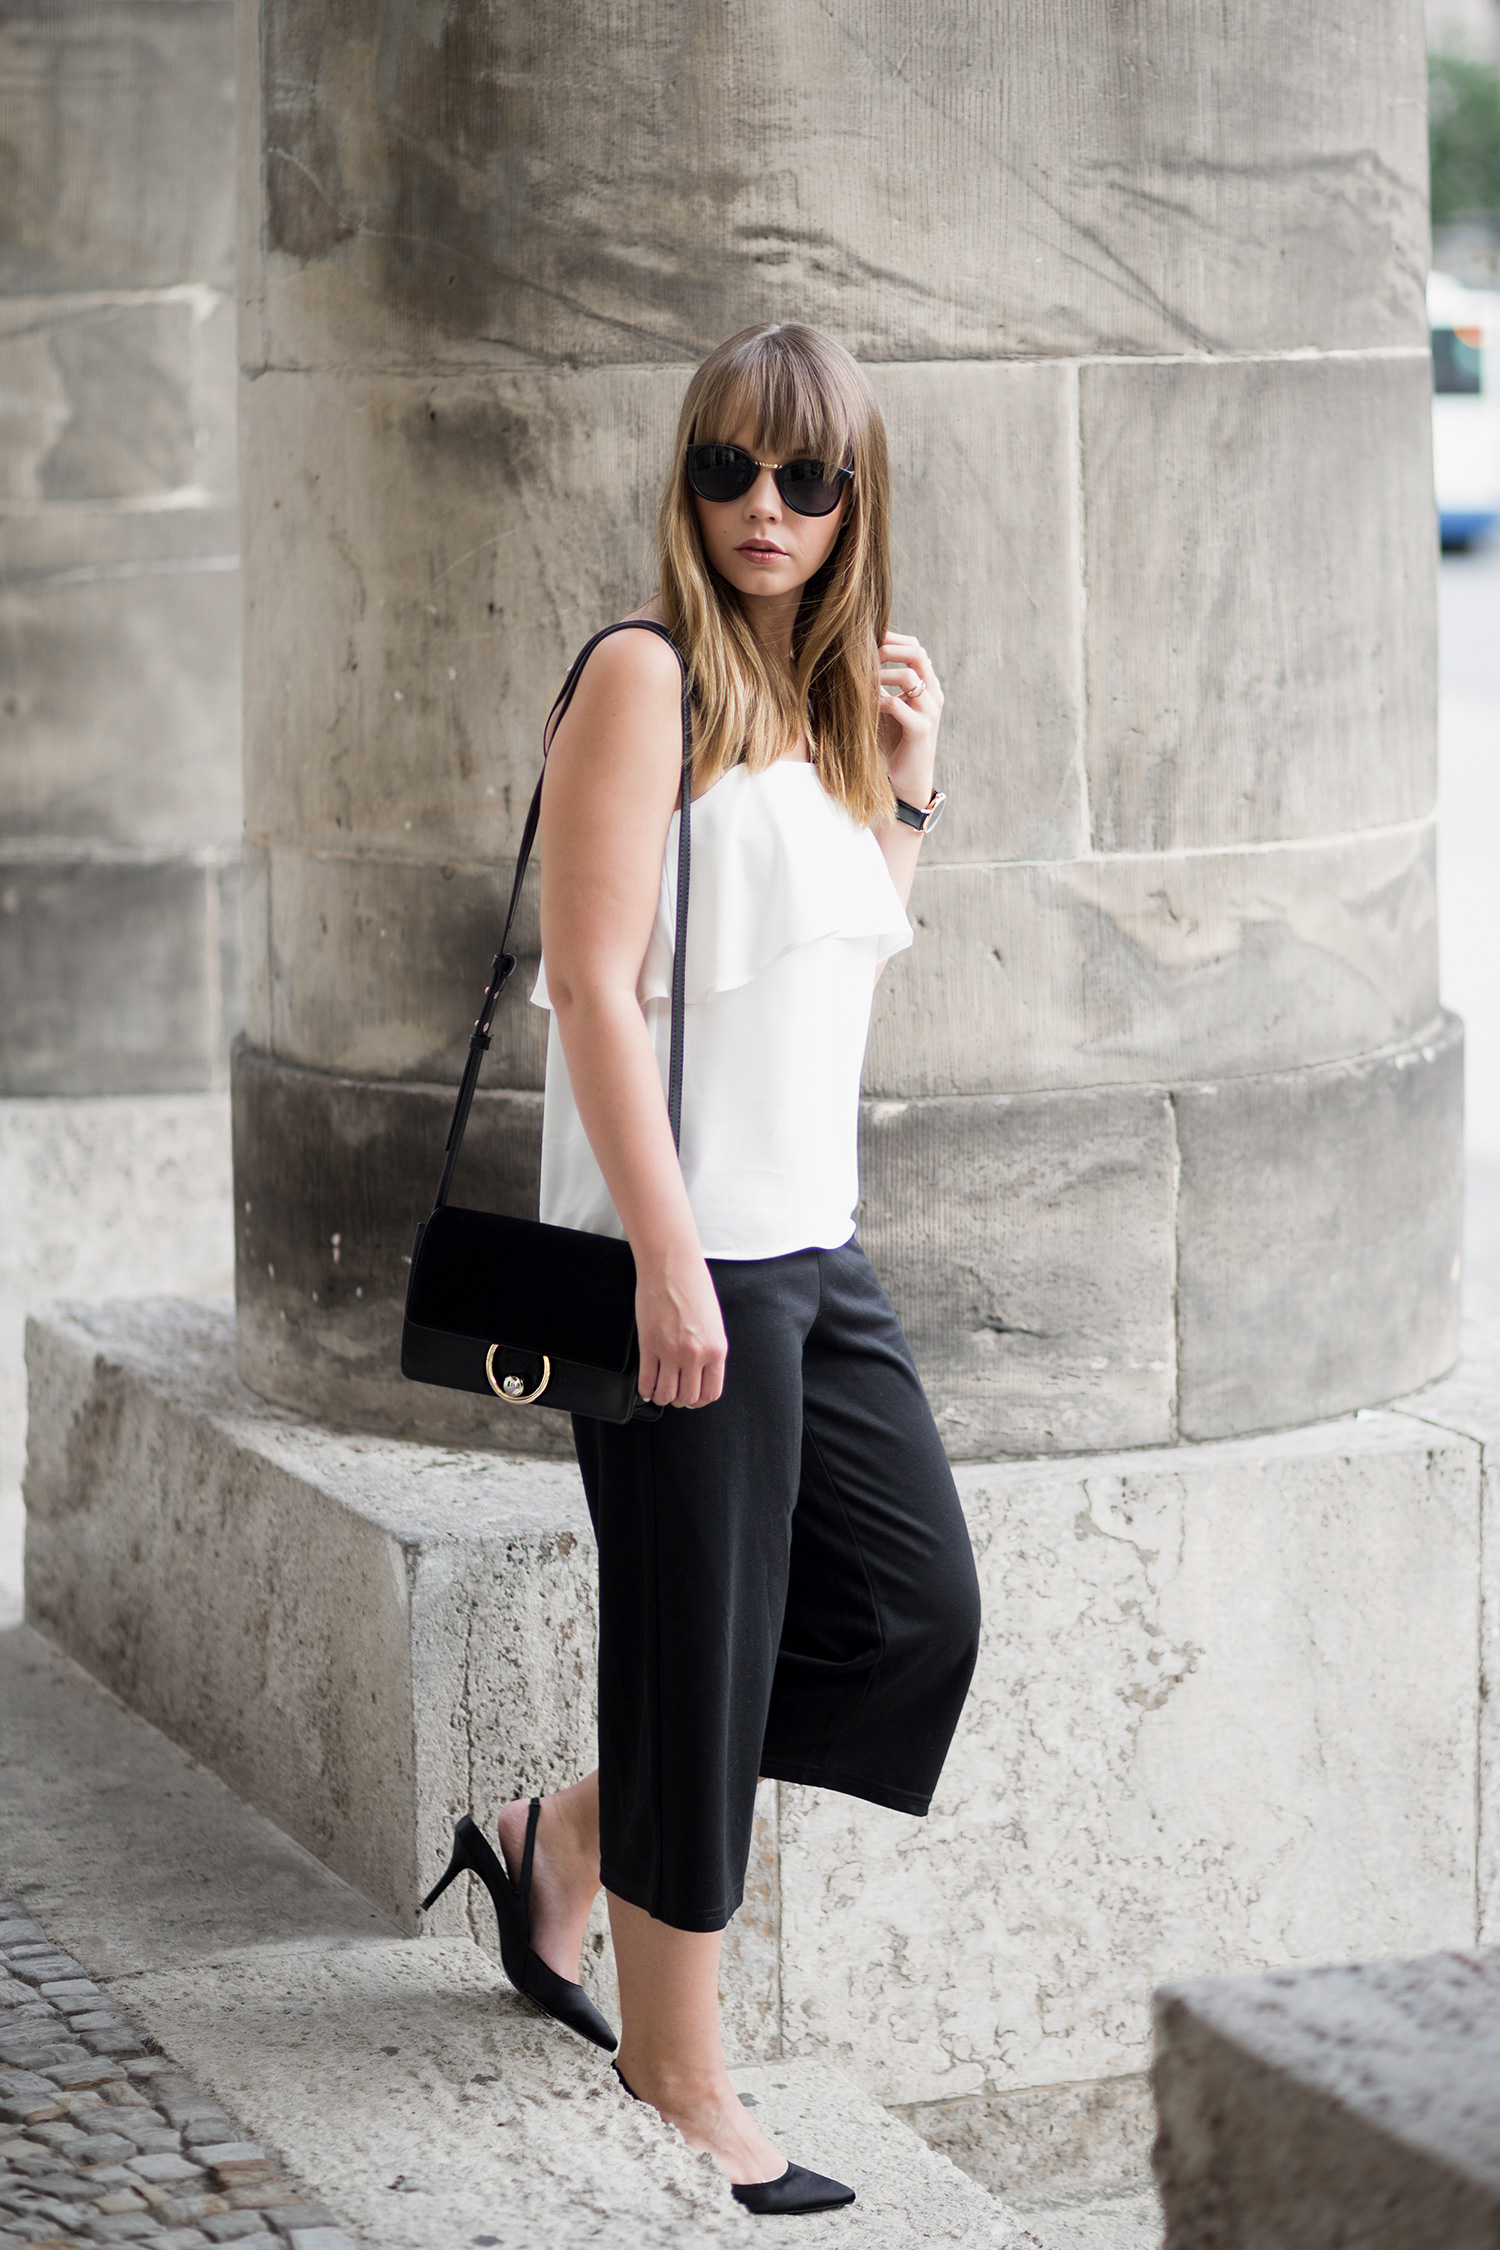 Outfit mit Volant Top von H&M, schwarze Culotte, Zara Slingback Pumps, Sommertrends 2017, Streetstyle, bezauberndenana.de